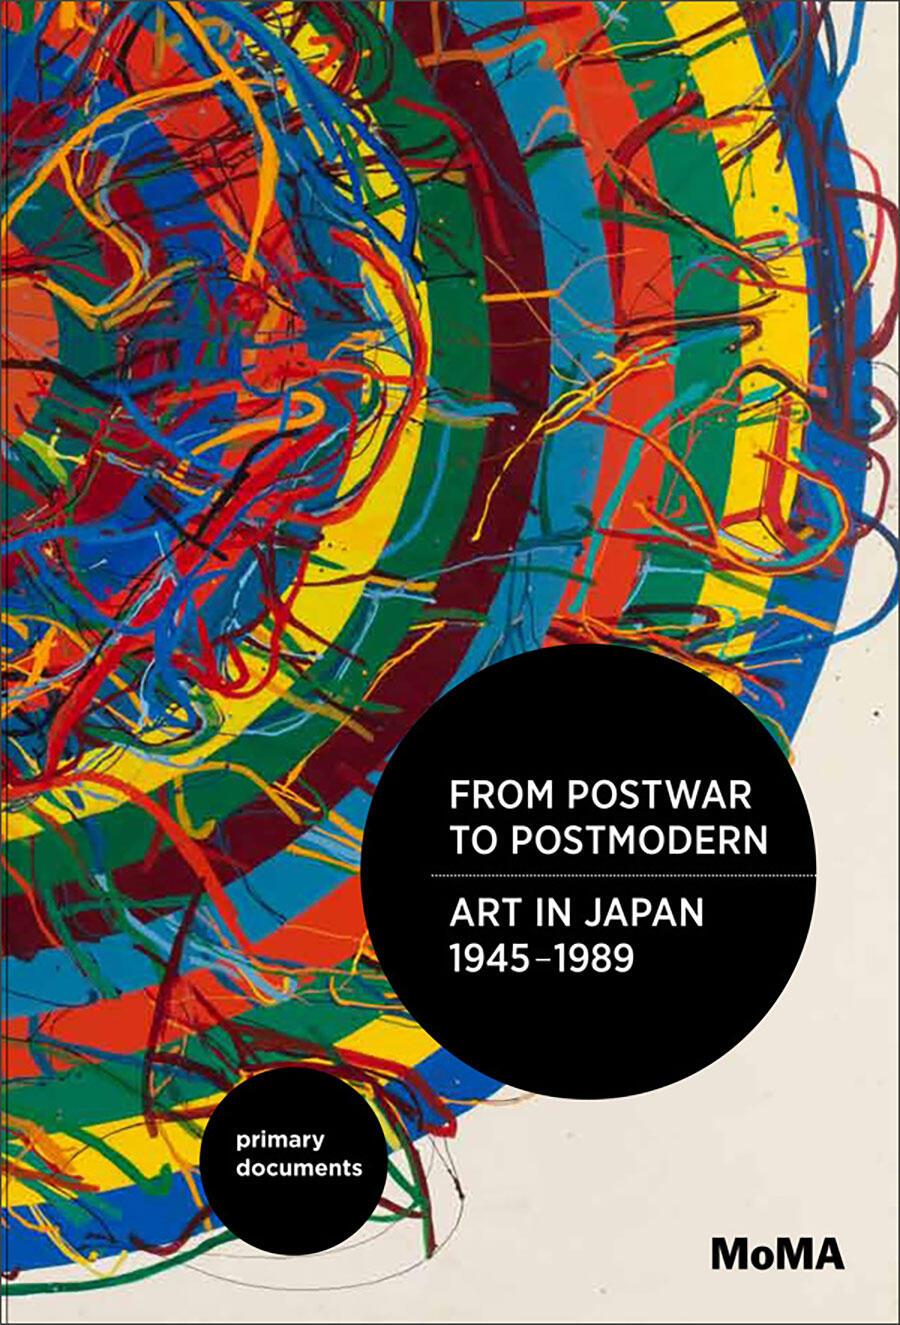 from-postwar-to-postmodern-art-in-japan-cover